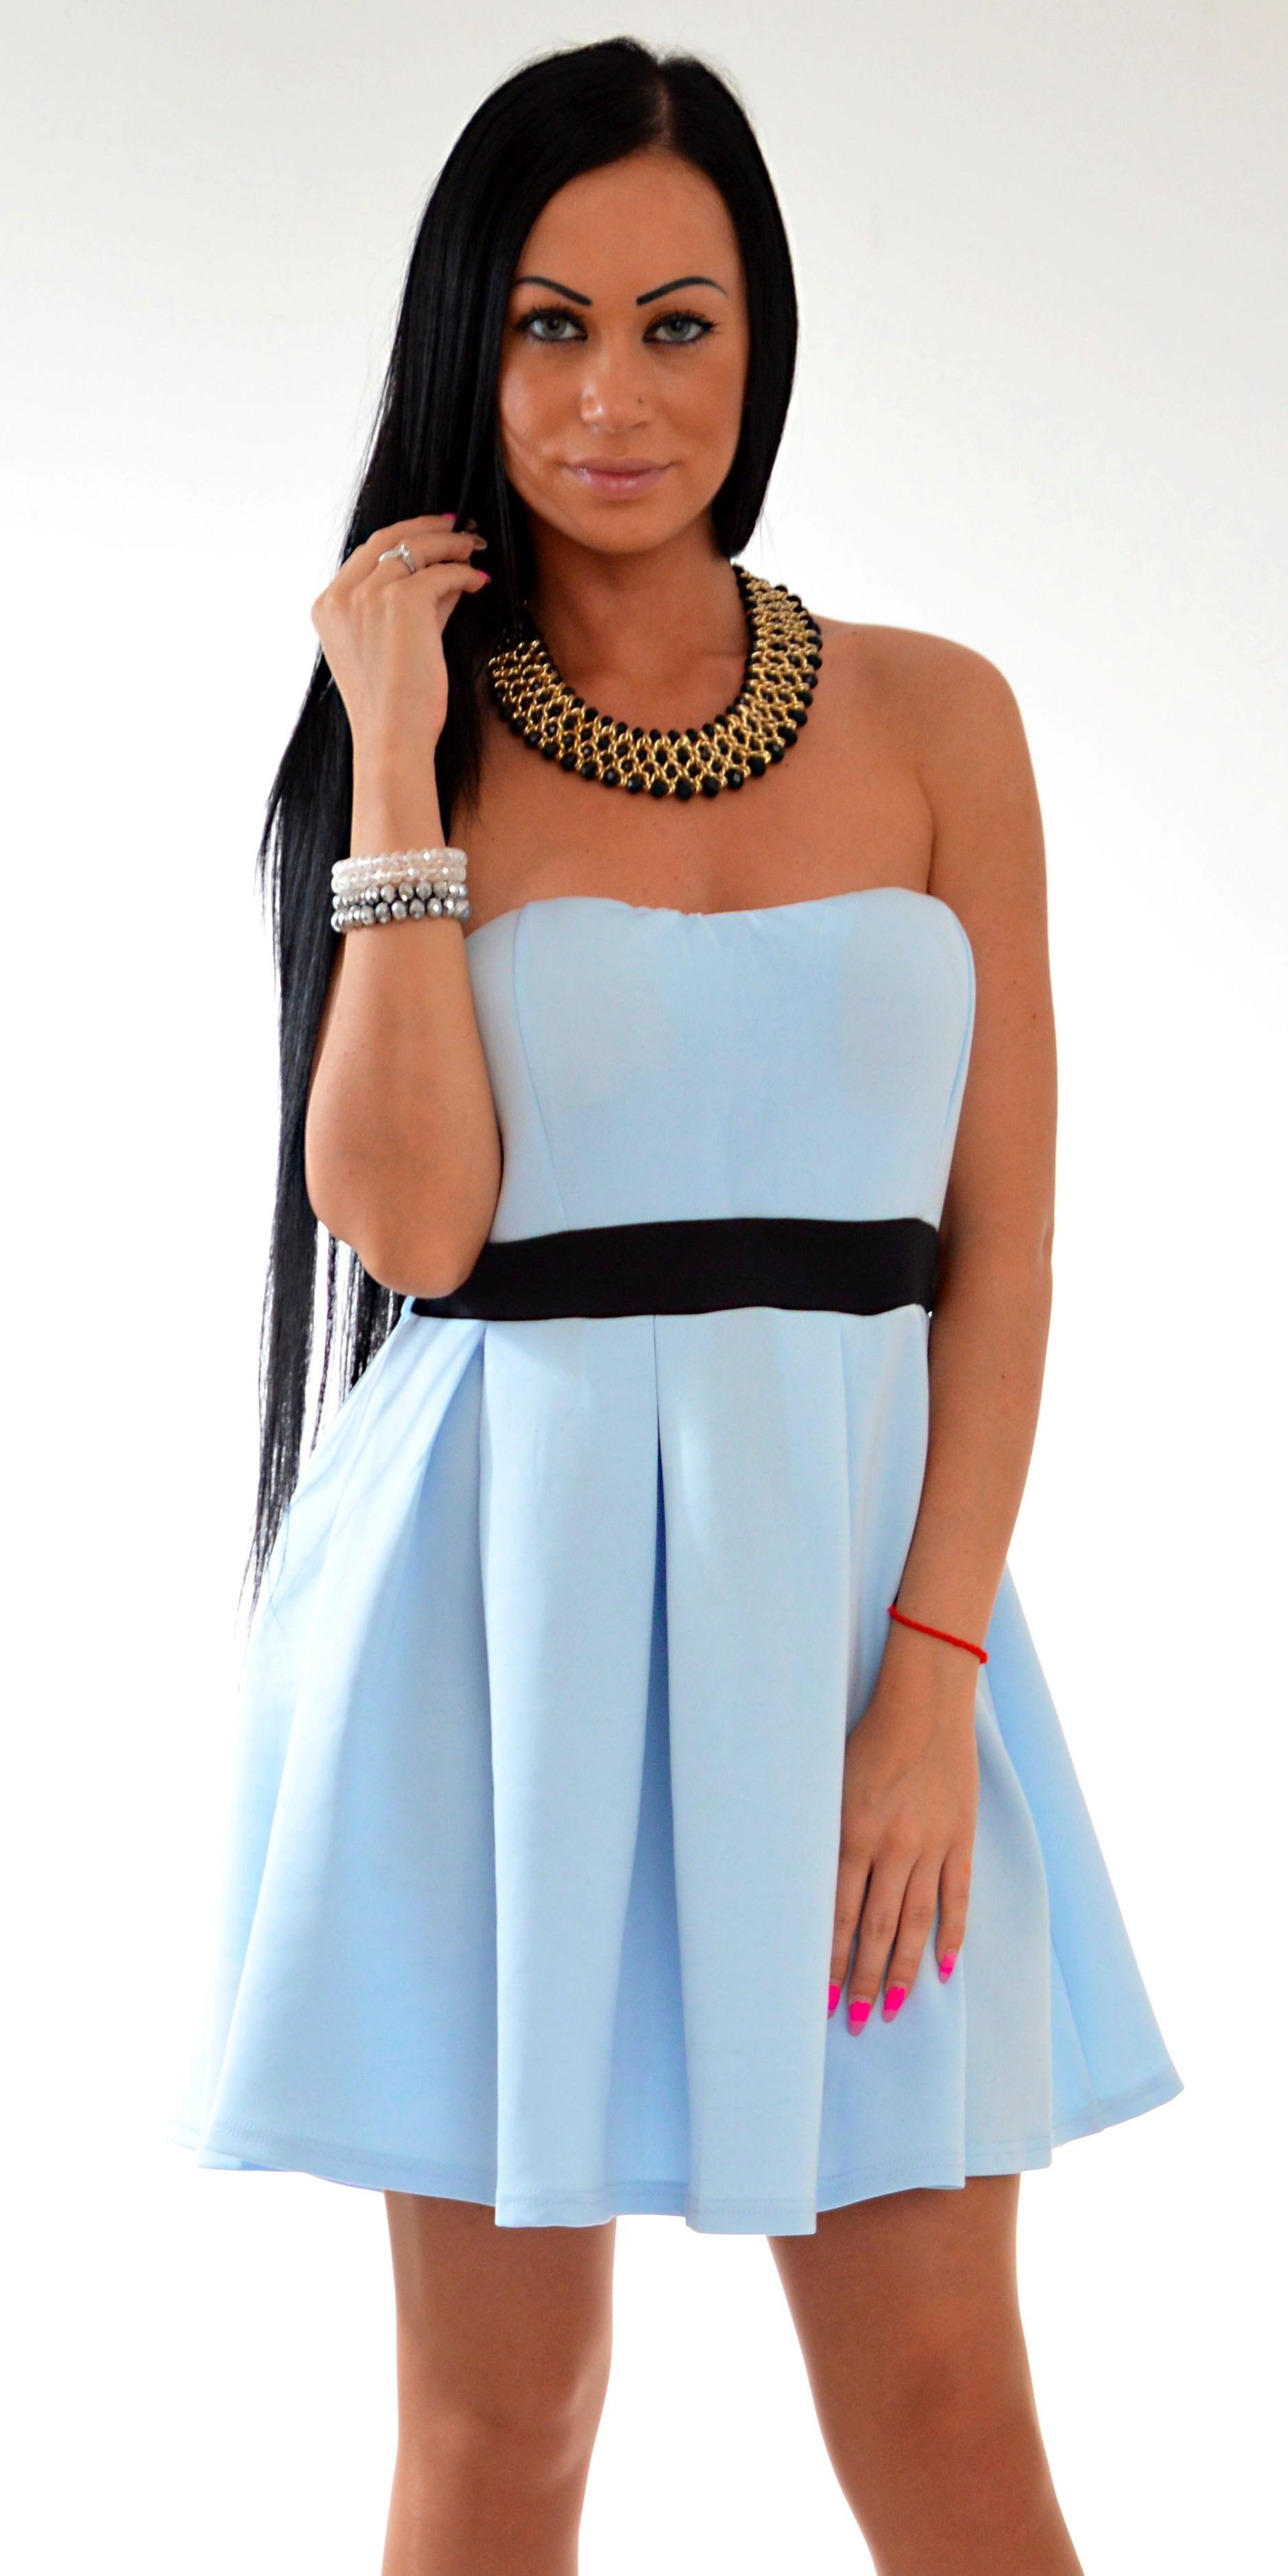 7583dcde40b3 Modré dámske oblečenie je trendy a moderné. Predstavíme Vám ...